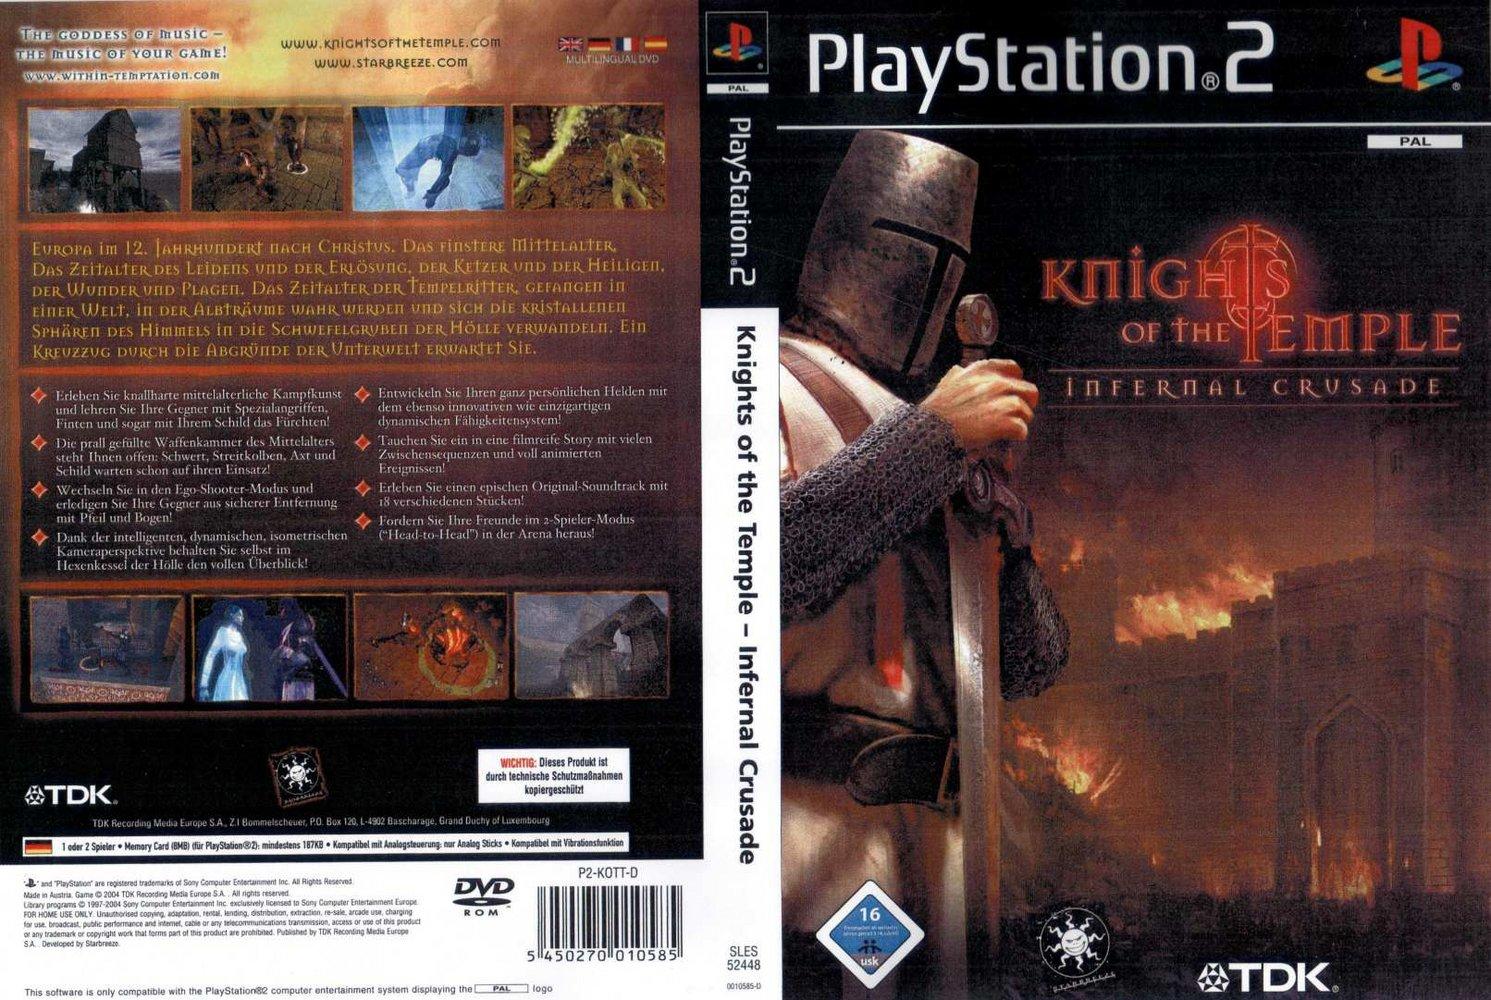 KnightsofTheTempleInfernalCrusadeGoldEdition